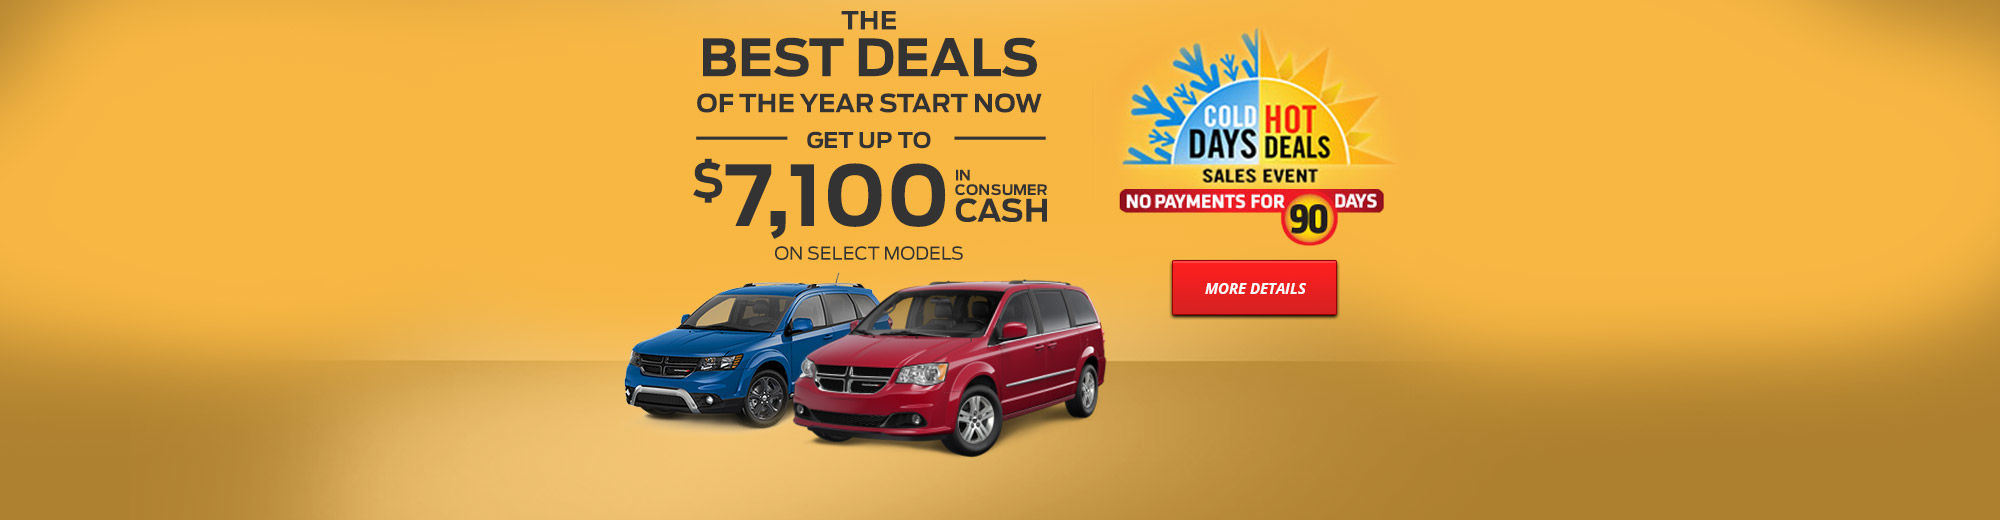 Cold Days, Hot Deals Sales Event